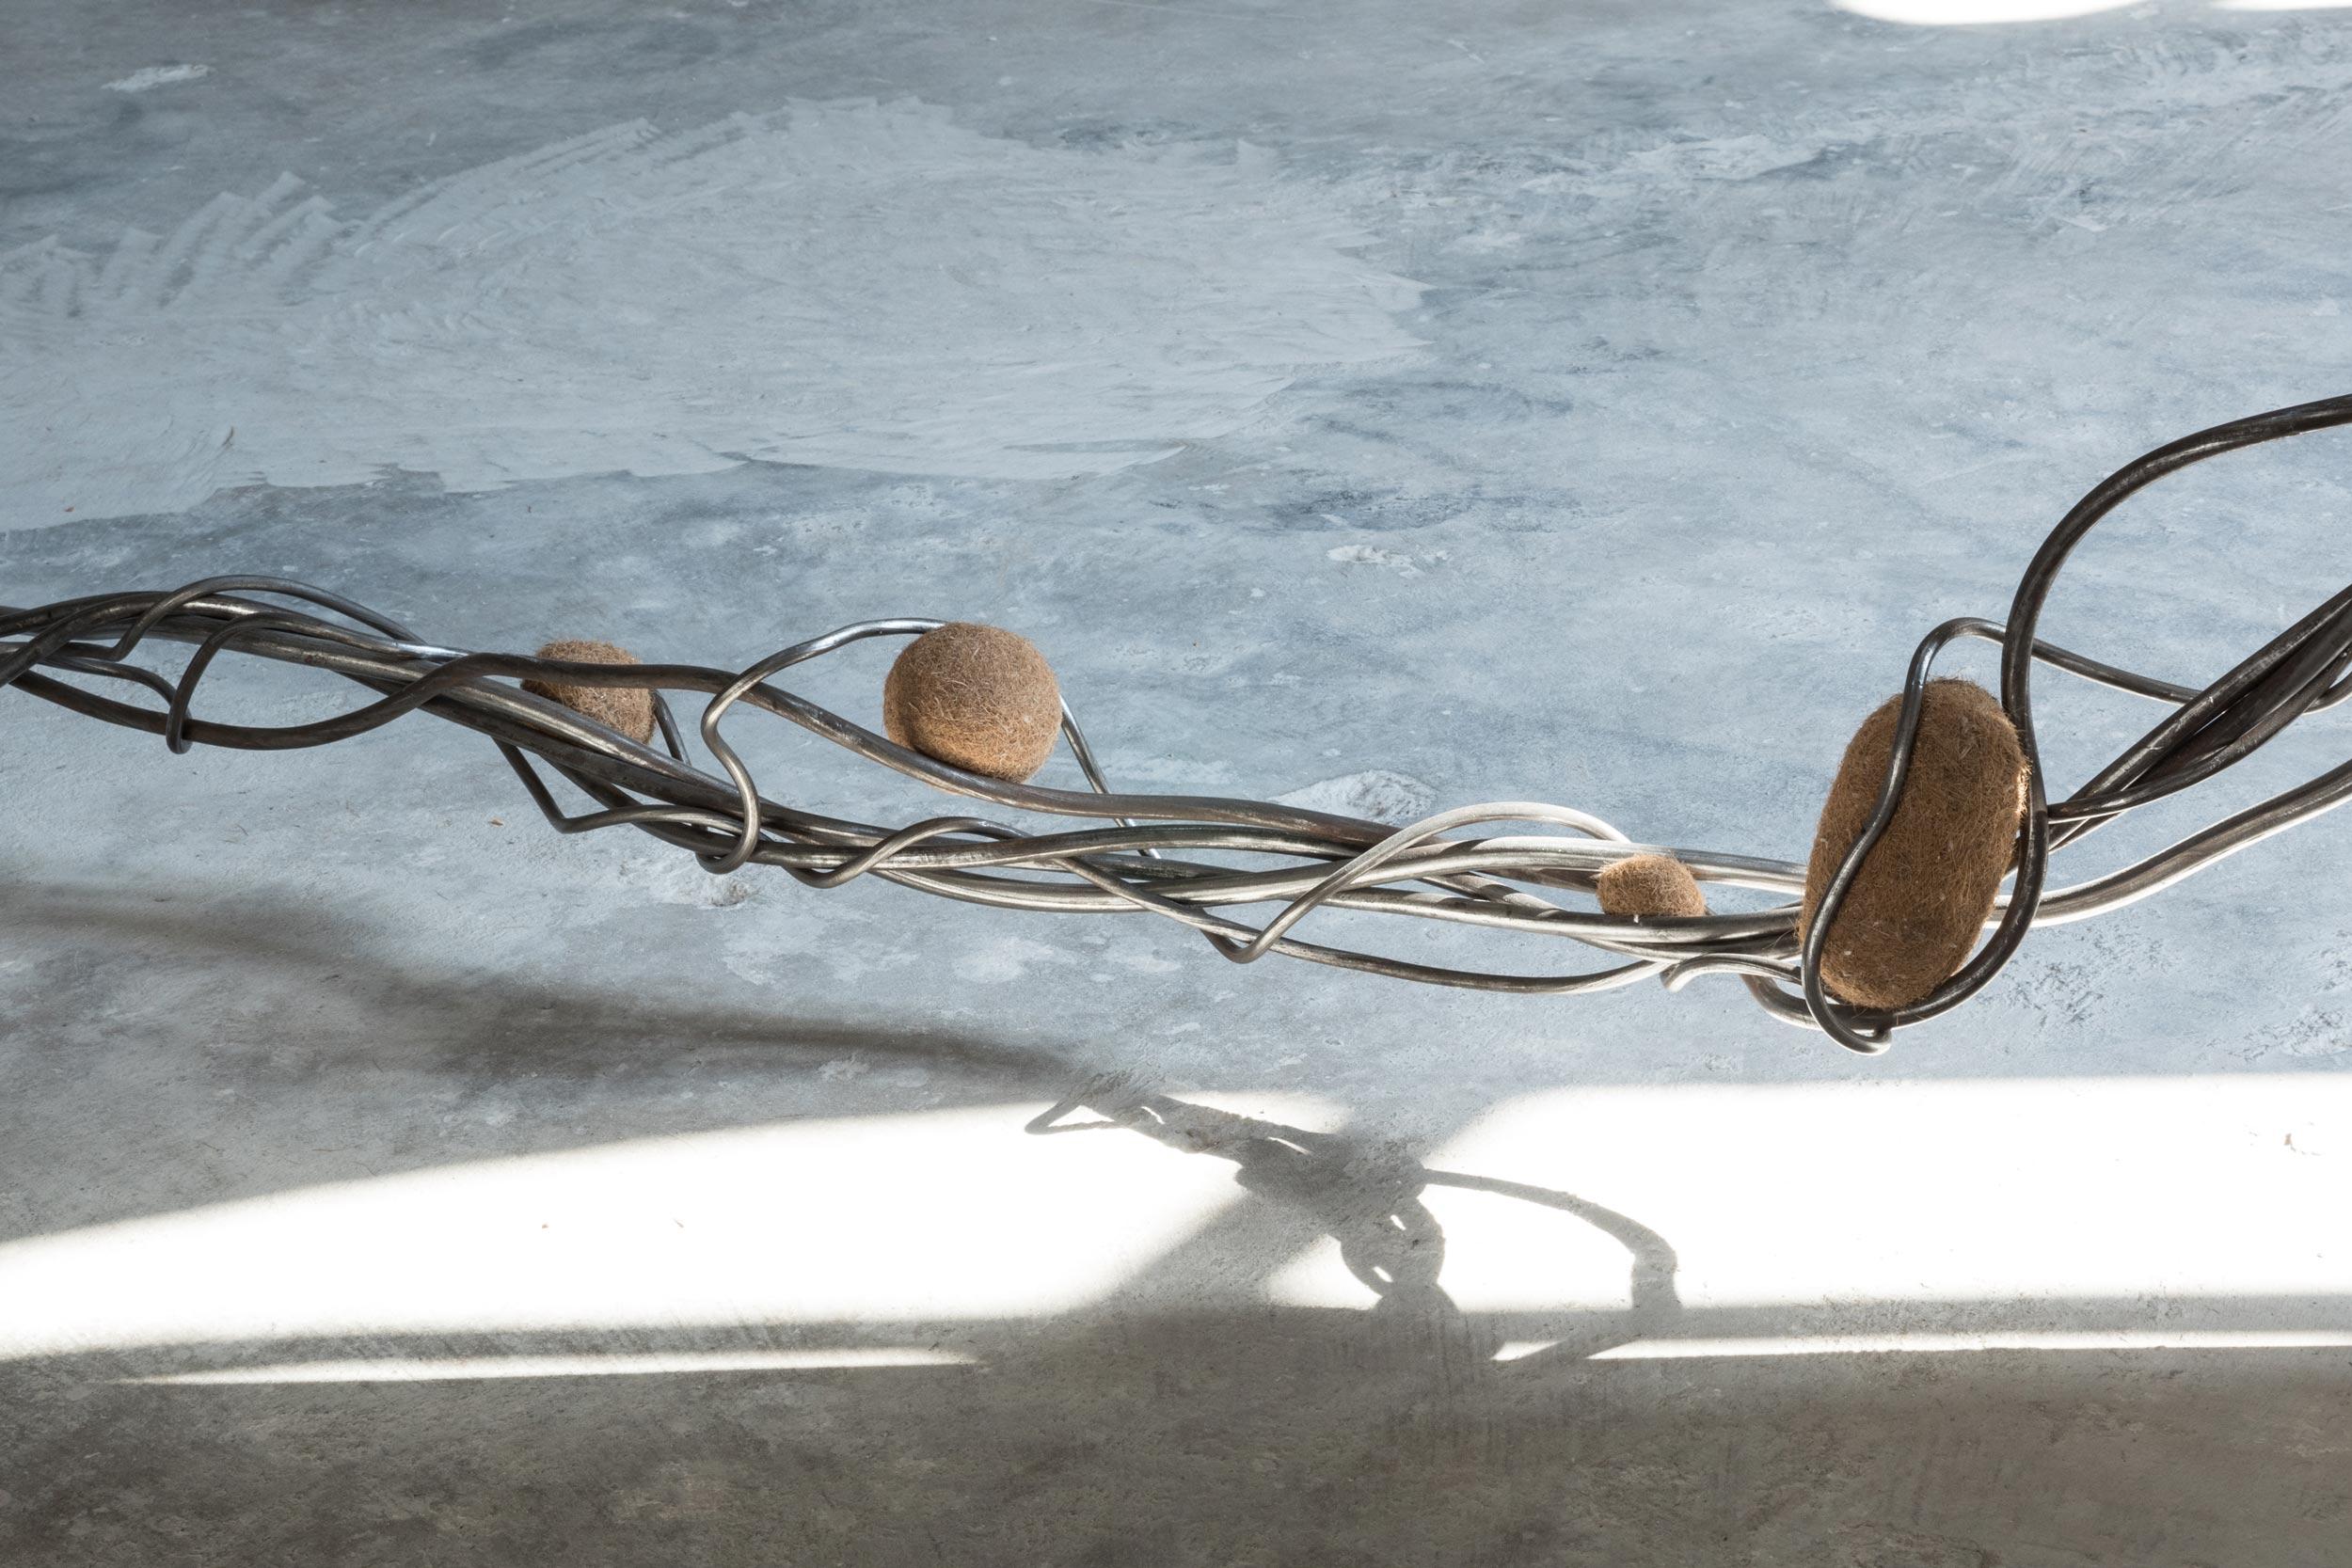 Nona Inescu, 'Intertangle II' (detail),  2021, steel, various vegetal insertions, dimensions variable.